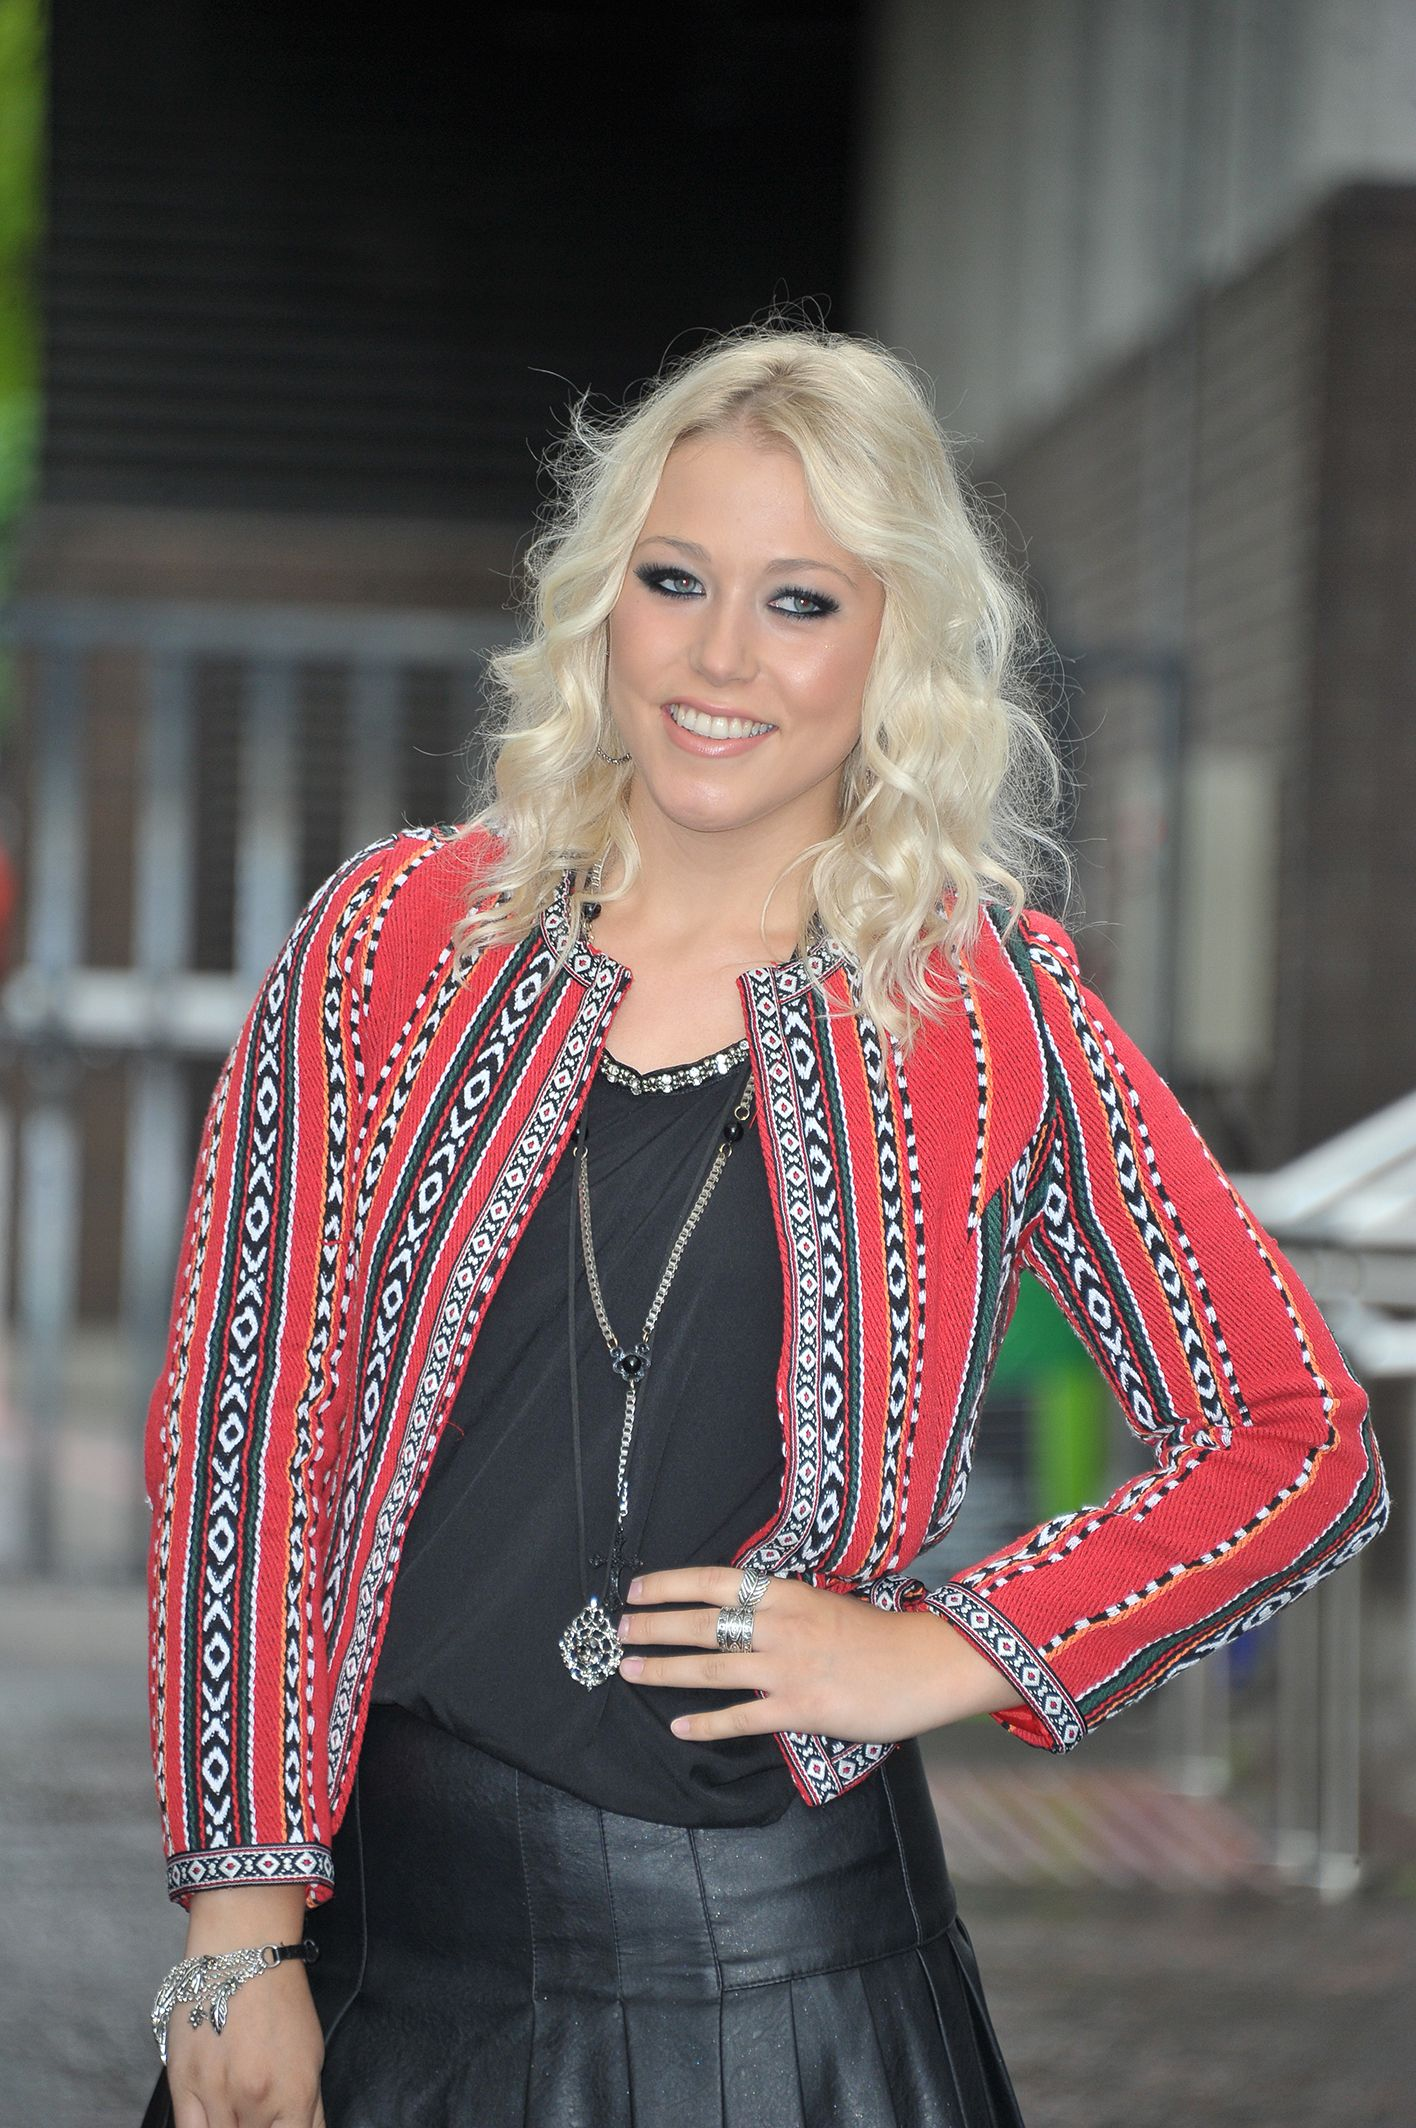 Amelia Lily at ITV Studios